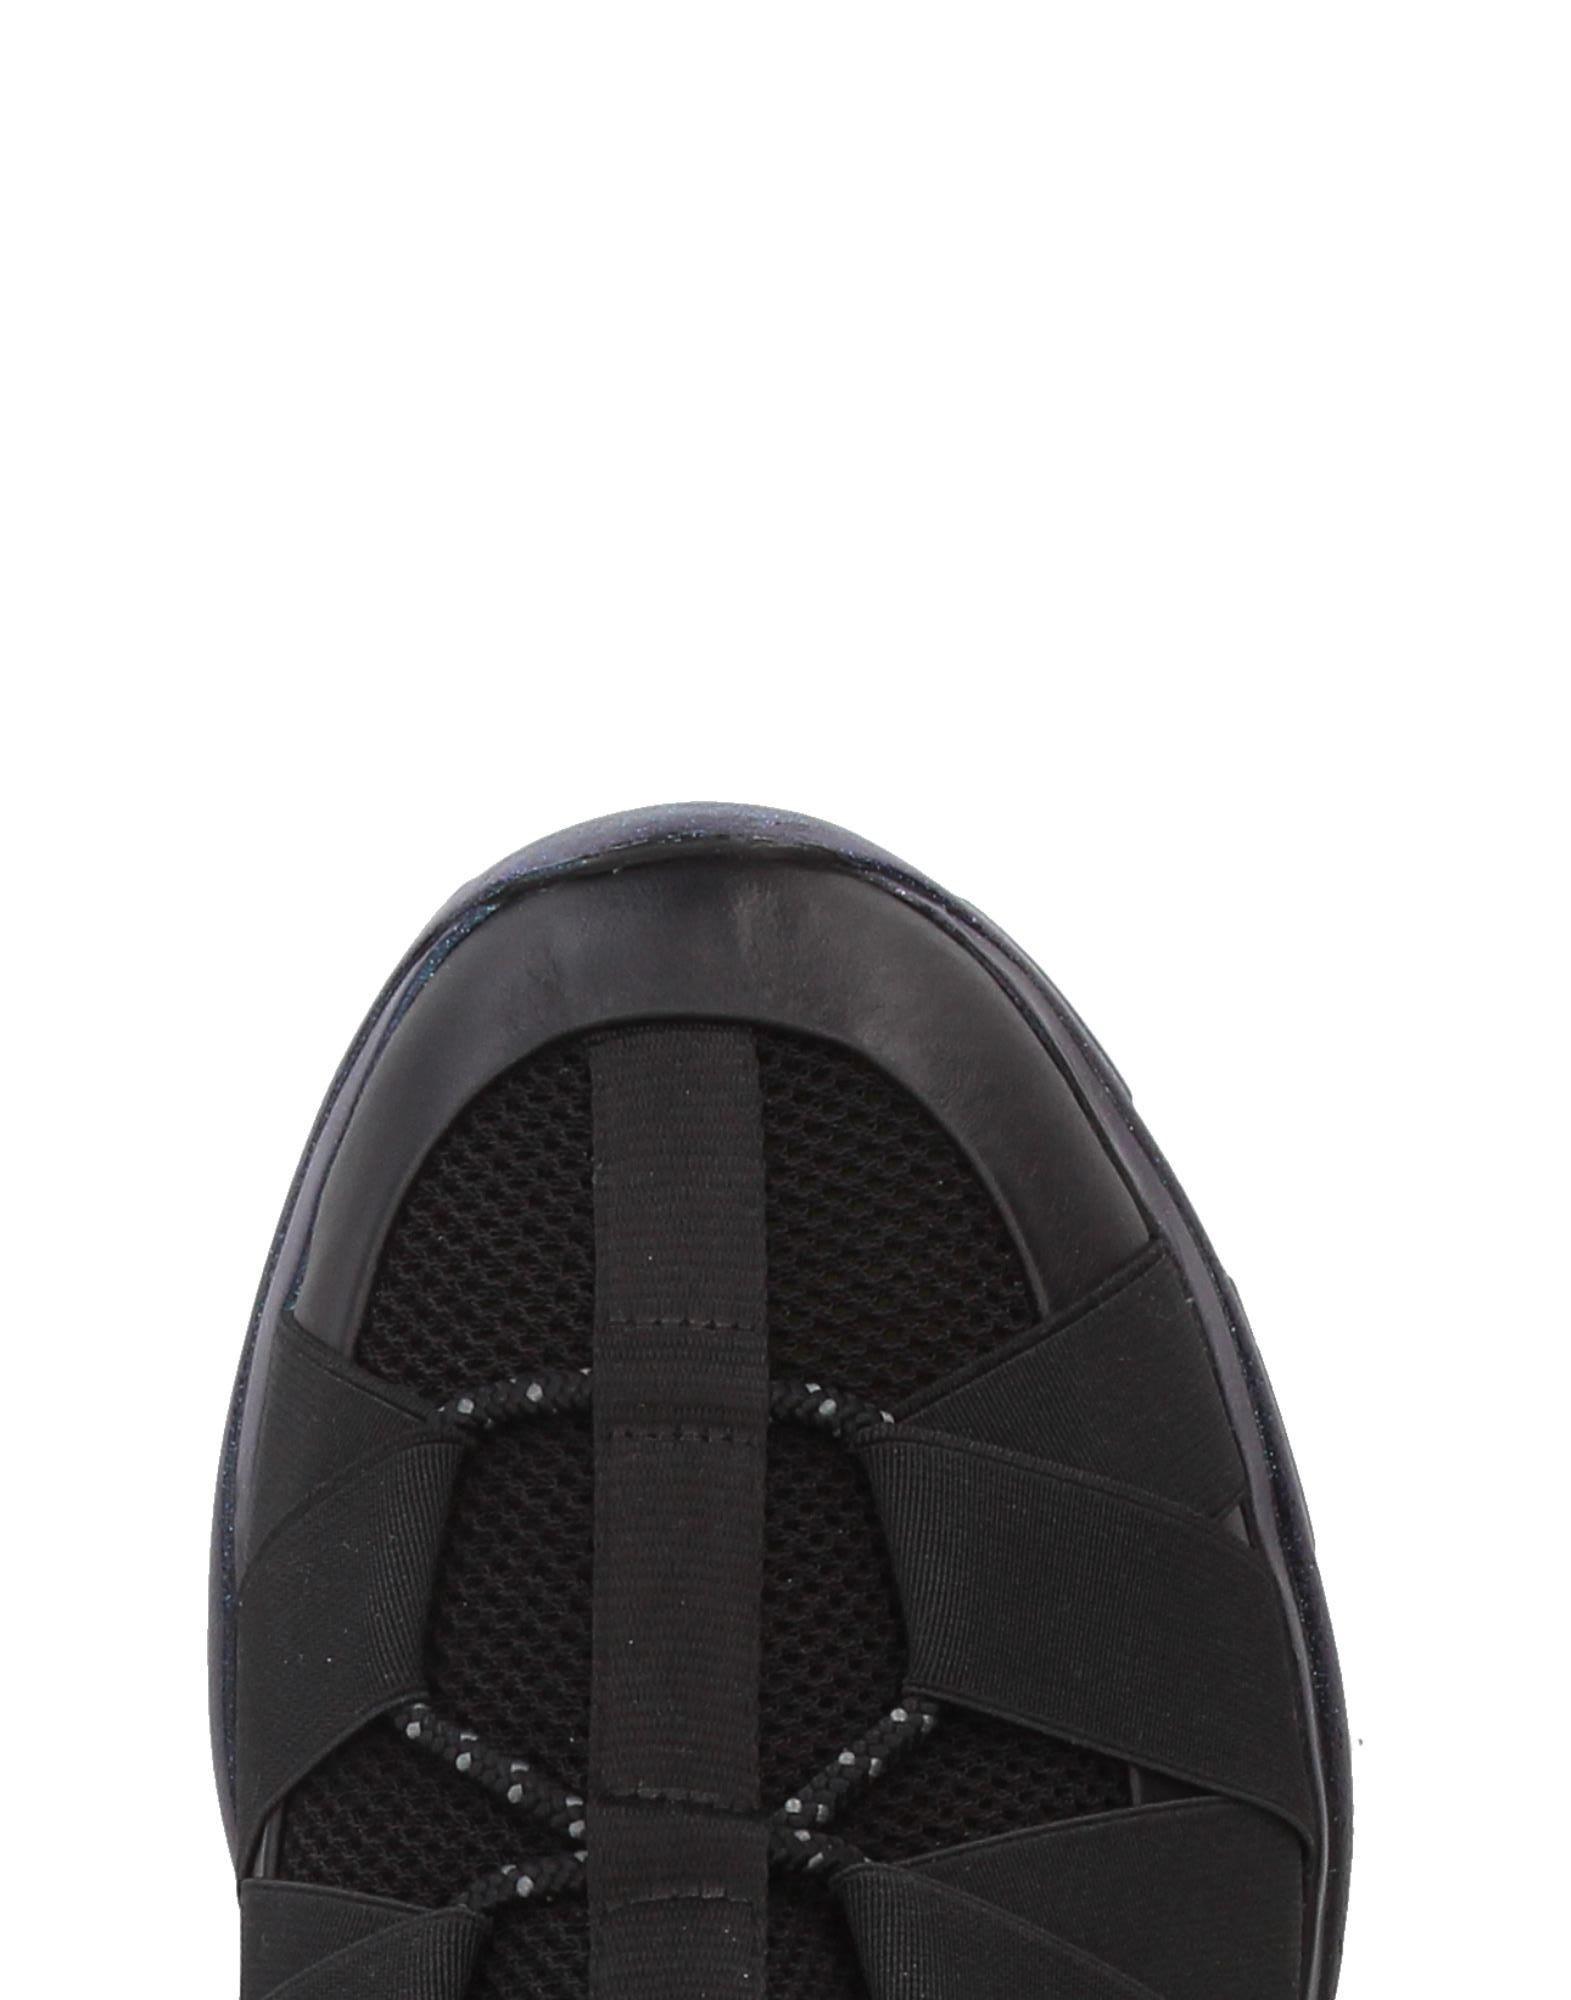 Christopher Christopher Christopher Kane Sneakers - Men Christopher Kane Sneakers online on  Canada - 11392513EE 41c20d